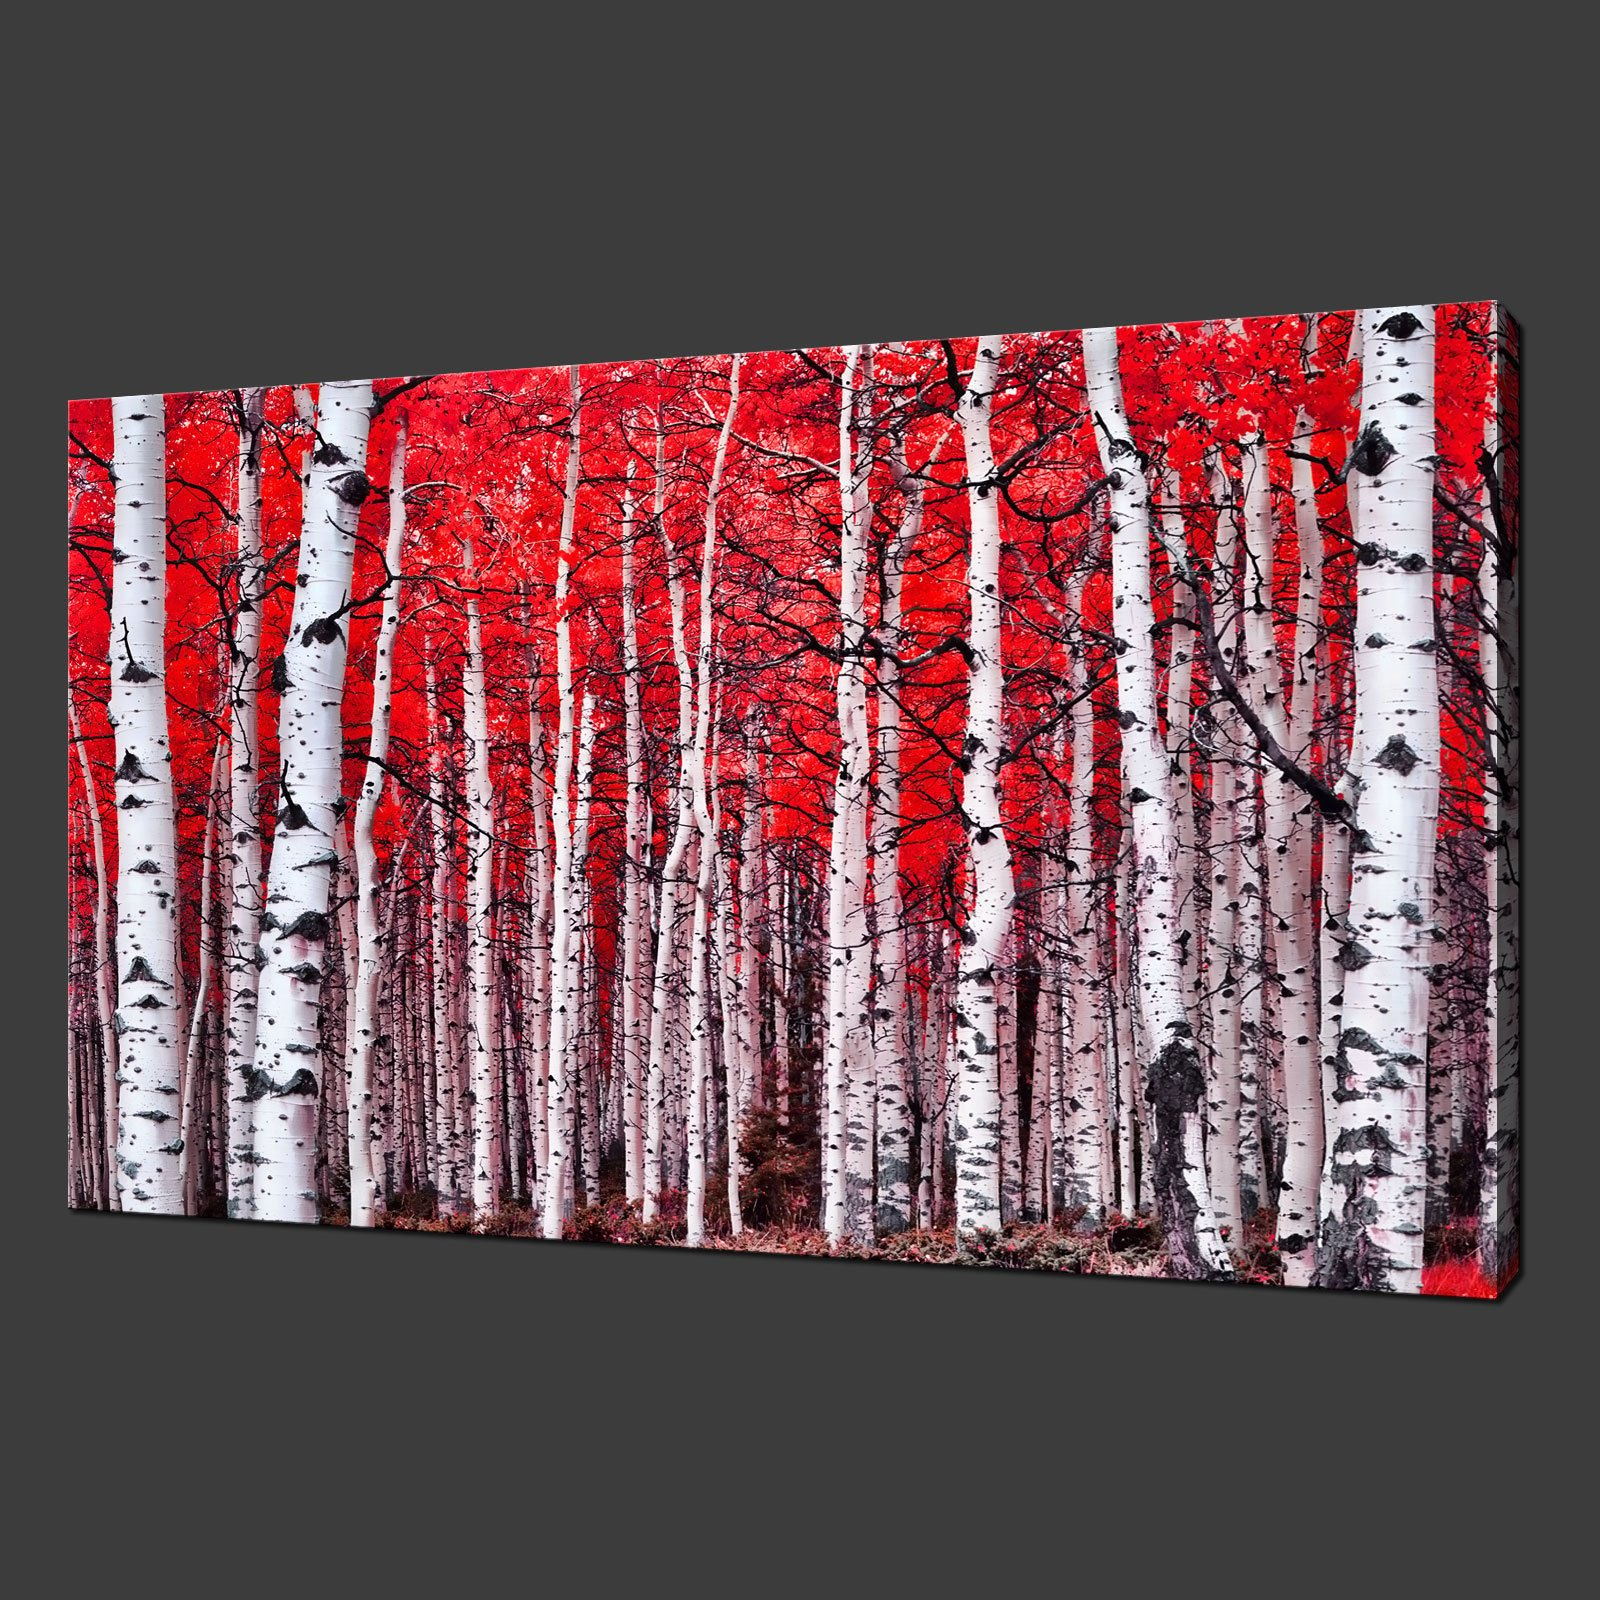 21d71a1560c RED BIRCH FOREST LANDSCAPE MODERN PICTURE CANVAS ...